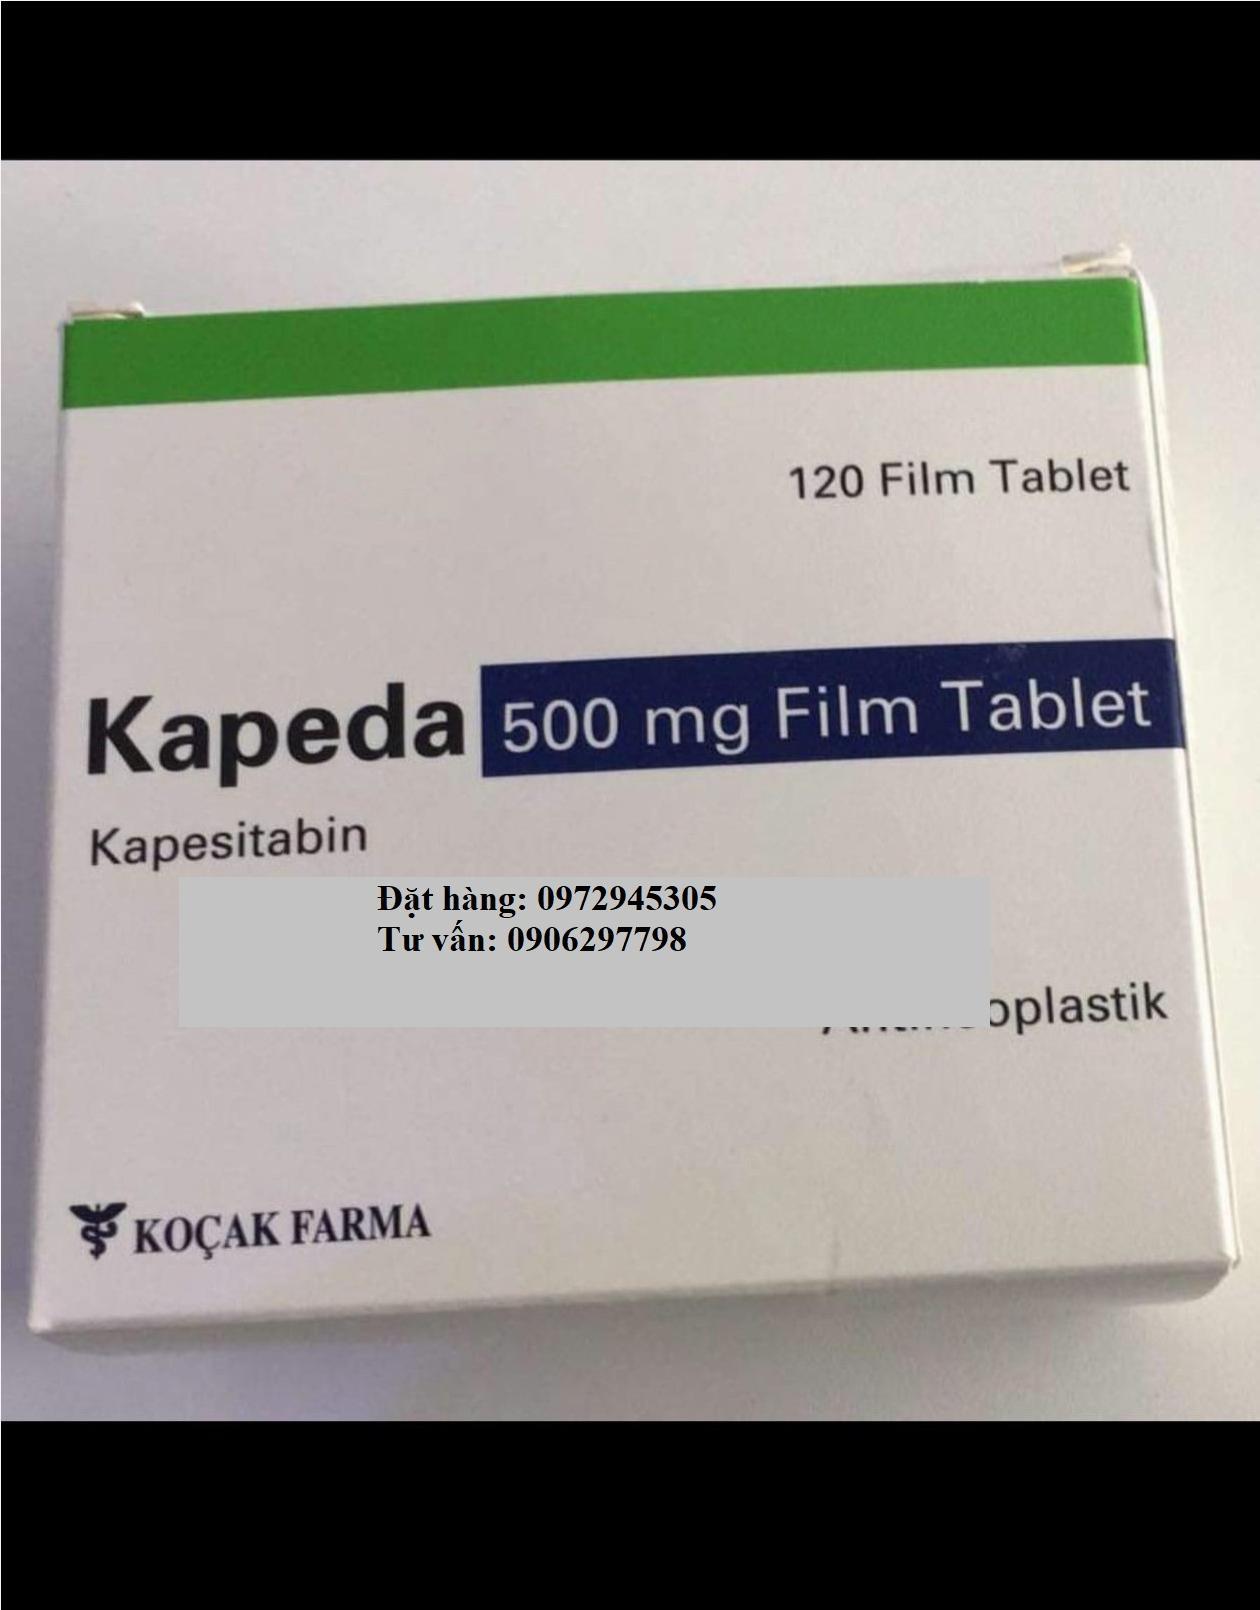 Thuốc Kapeda Kapesitabin 500mg giá bao nhiêu mua ở đâu?